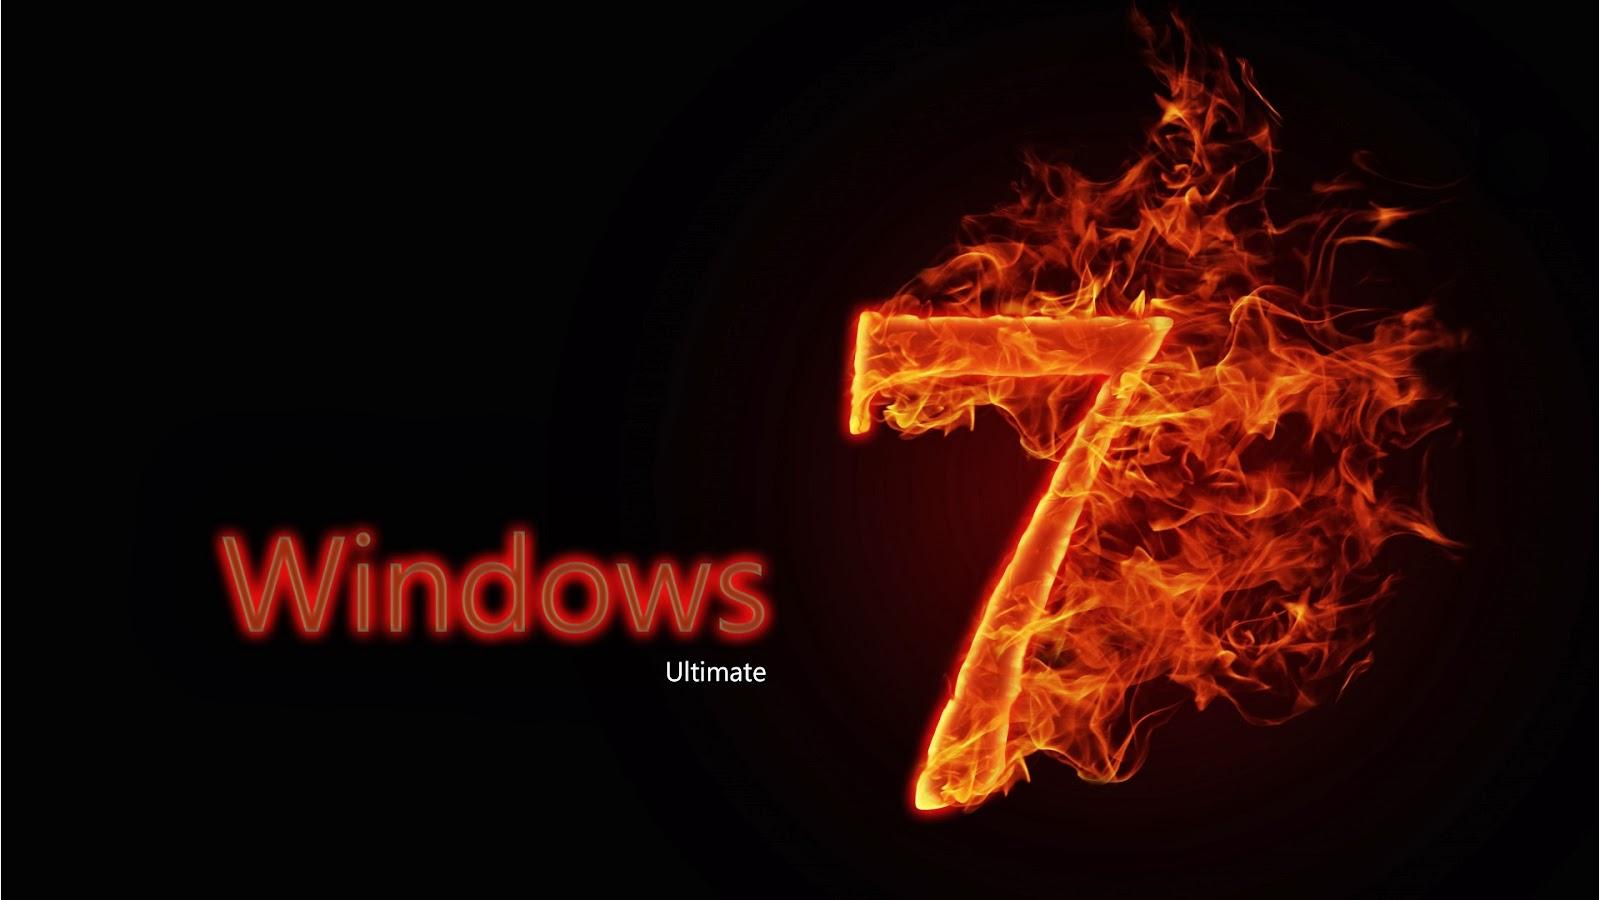 Windows 7 Ultimate Wallpapers   Imagem Do Windows 7 Ultimate Hd 1600x900